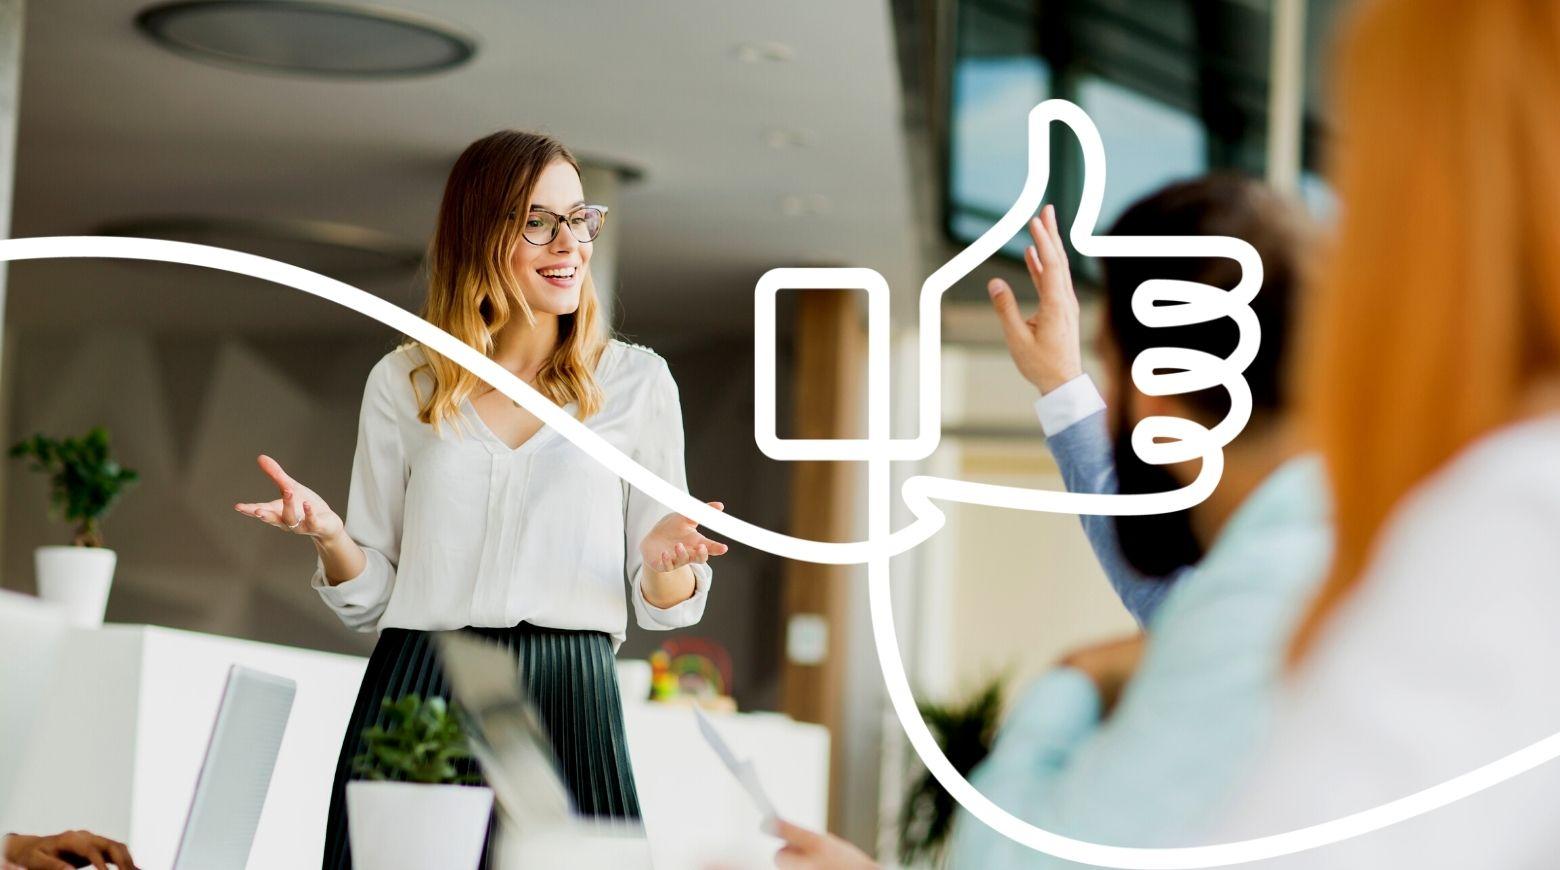 digital asset management for your business